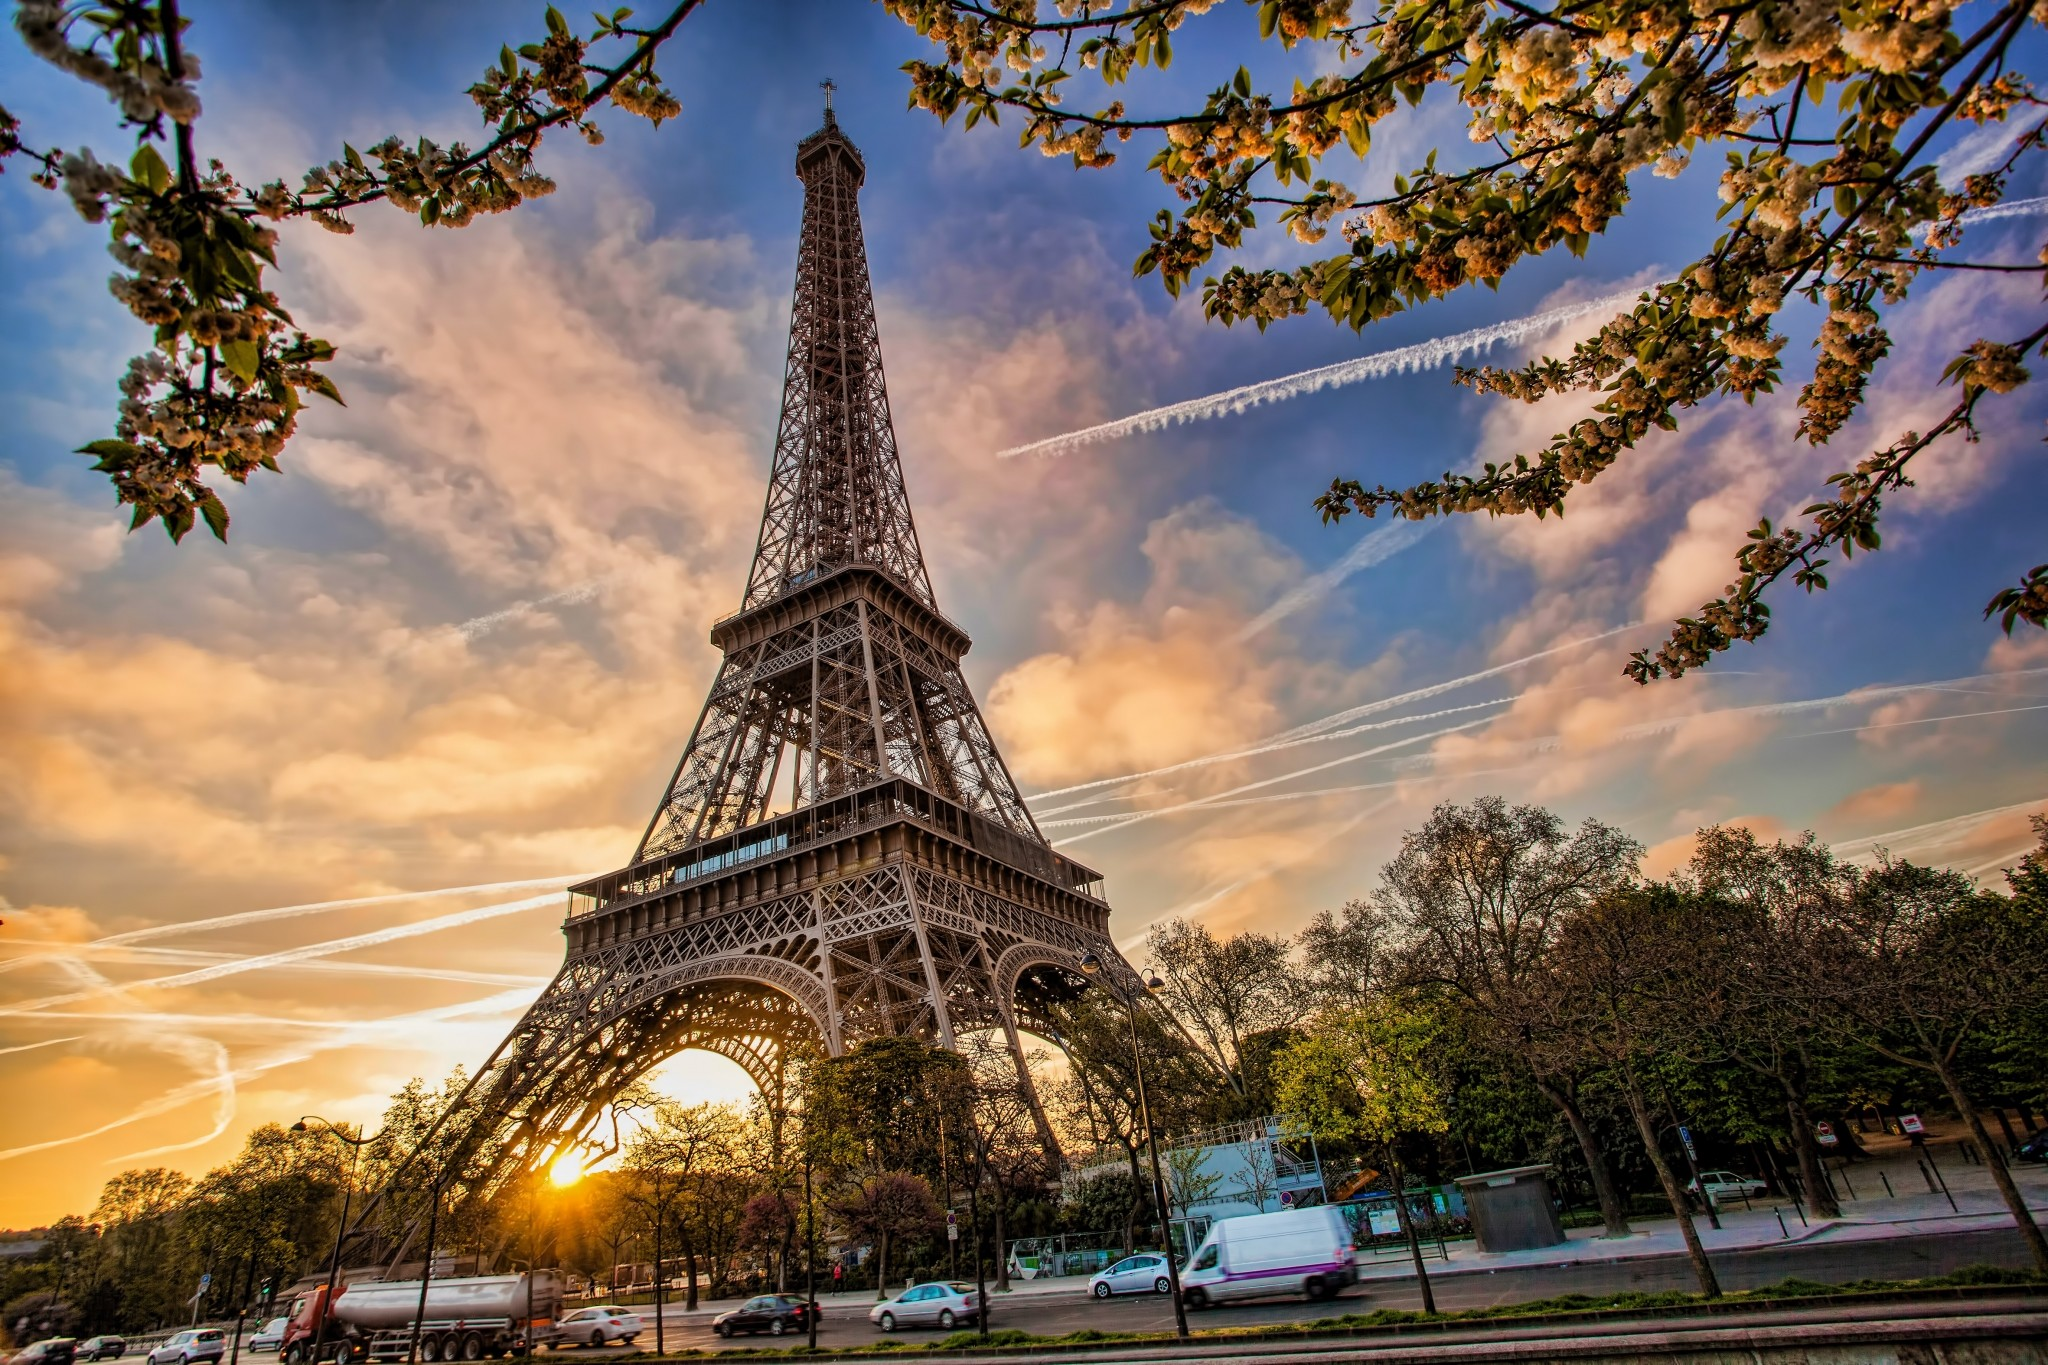 Wallpaper Of Paris 76 Pictures